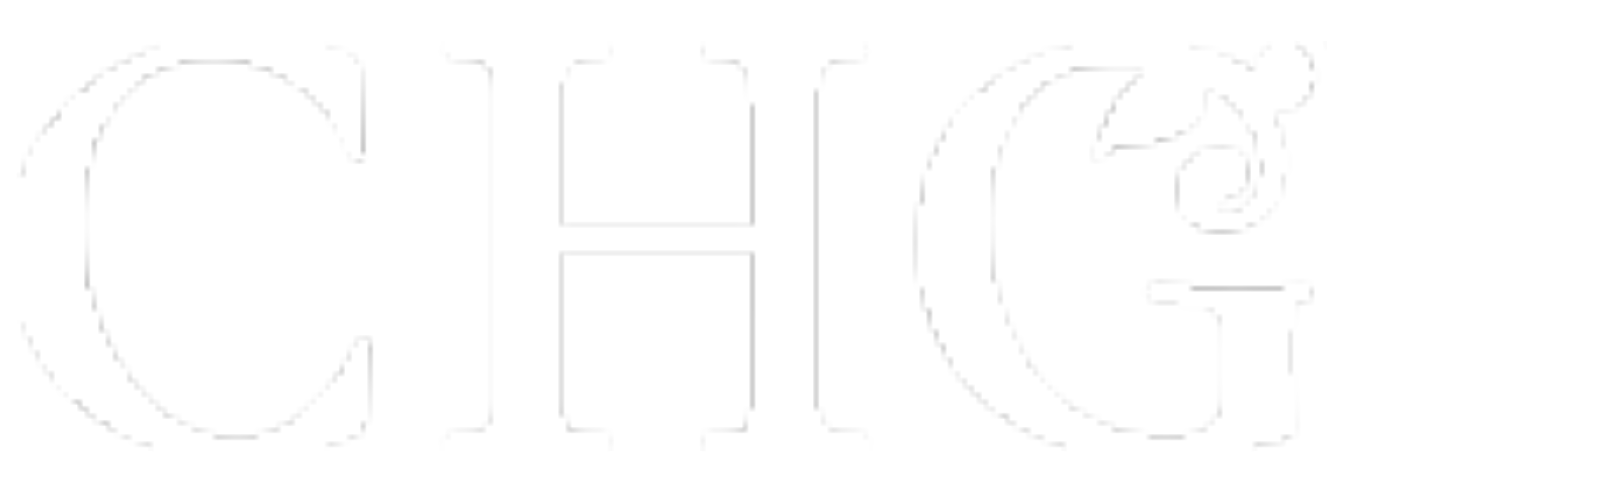 Classic Home and Garden logo